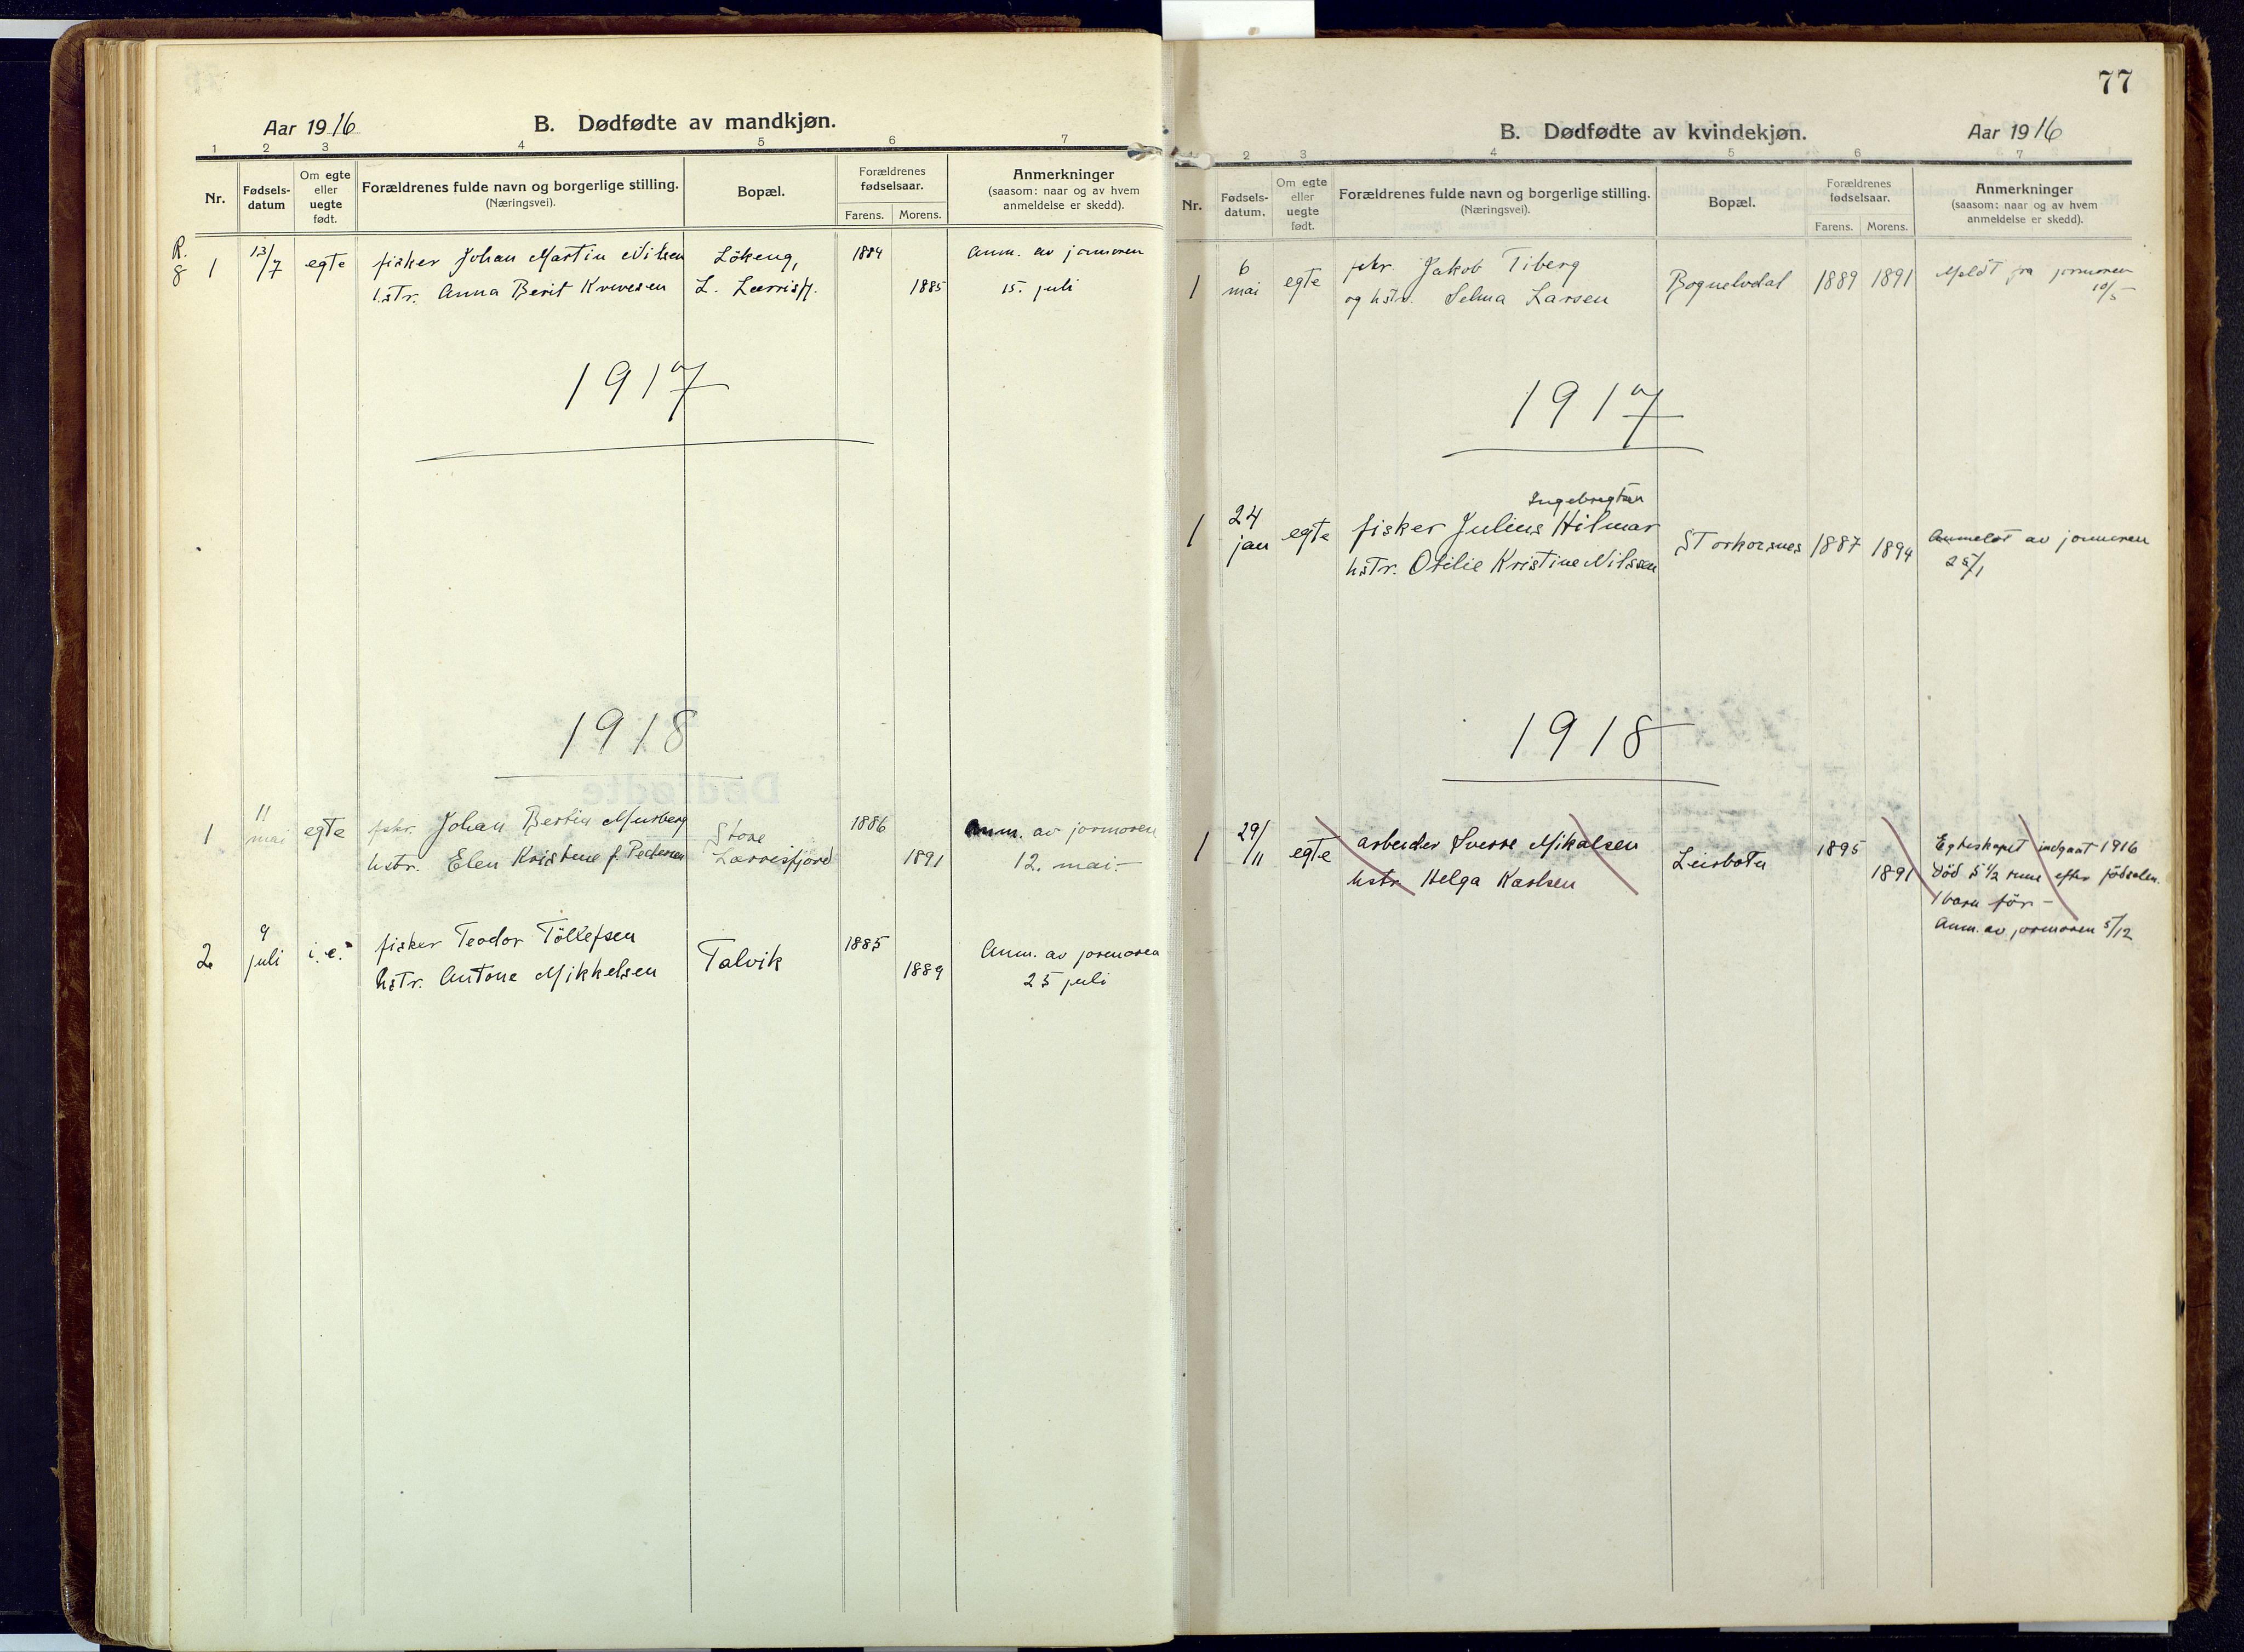 SATØ, Talvik sokneprestkontor, H/Ha/L0018kirke: Ministerialbok nr. 18, 1915-1924, s. 77